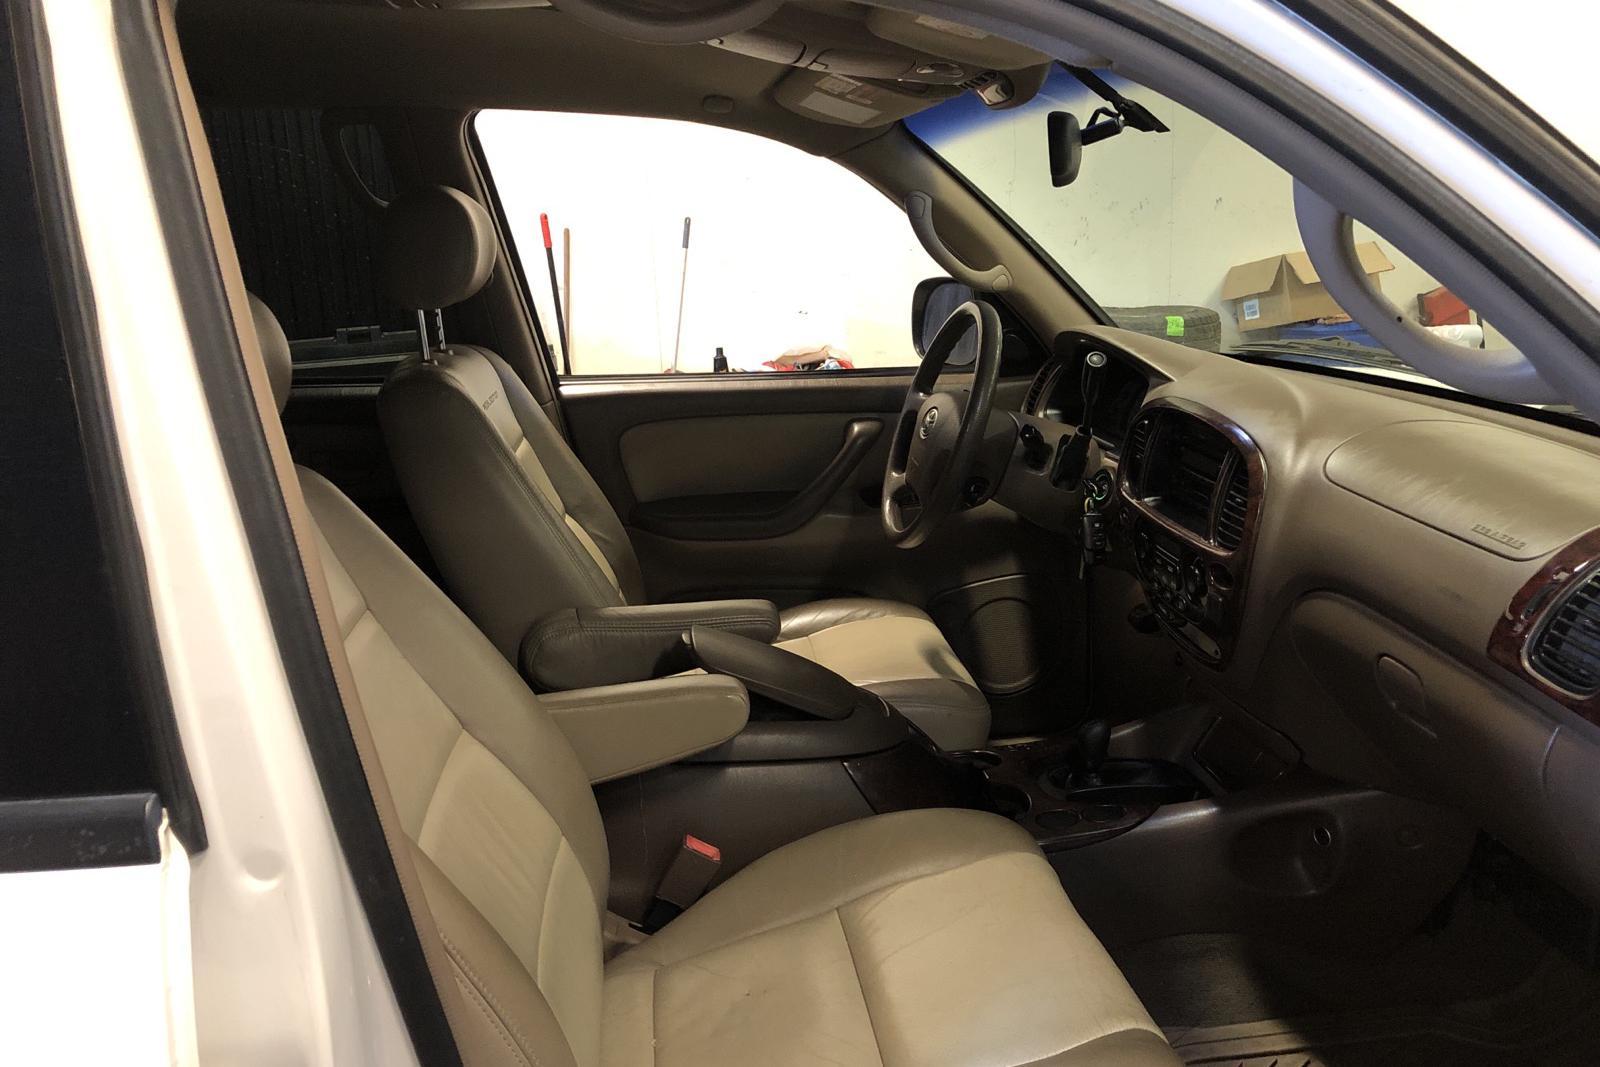 Toyota Sequoia 4.7 V8 4WD (243hk) - 27 000 mil - Automat - vit